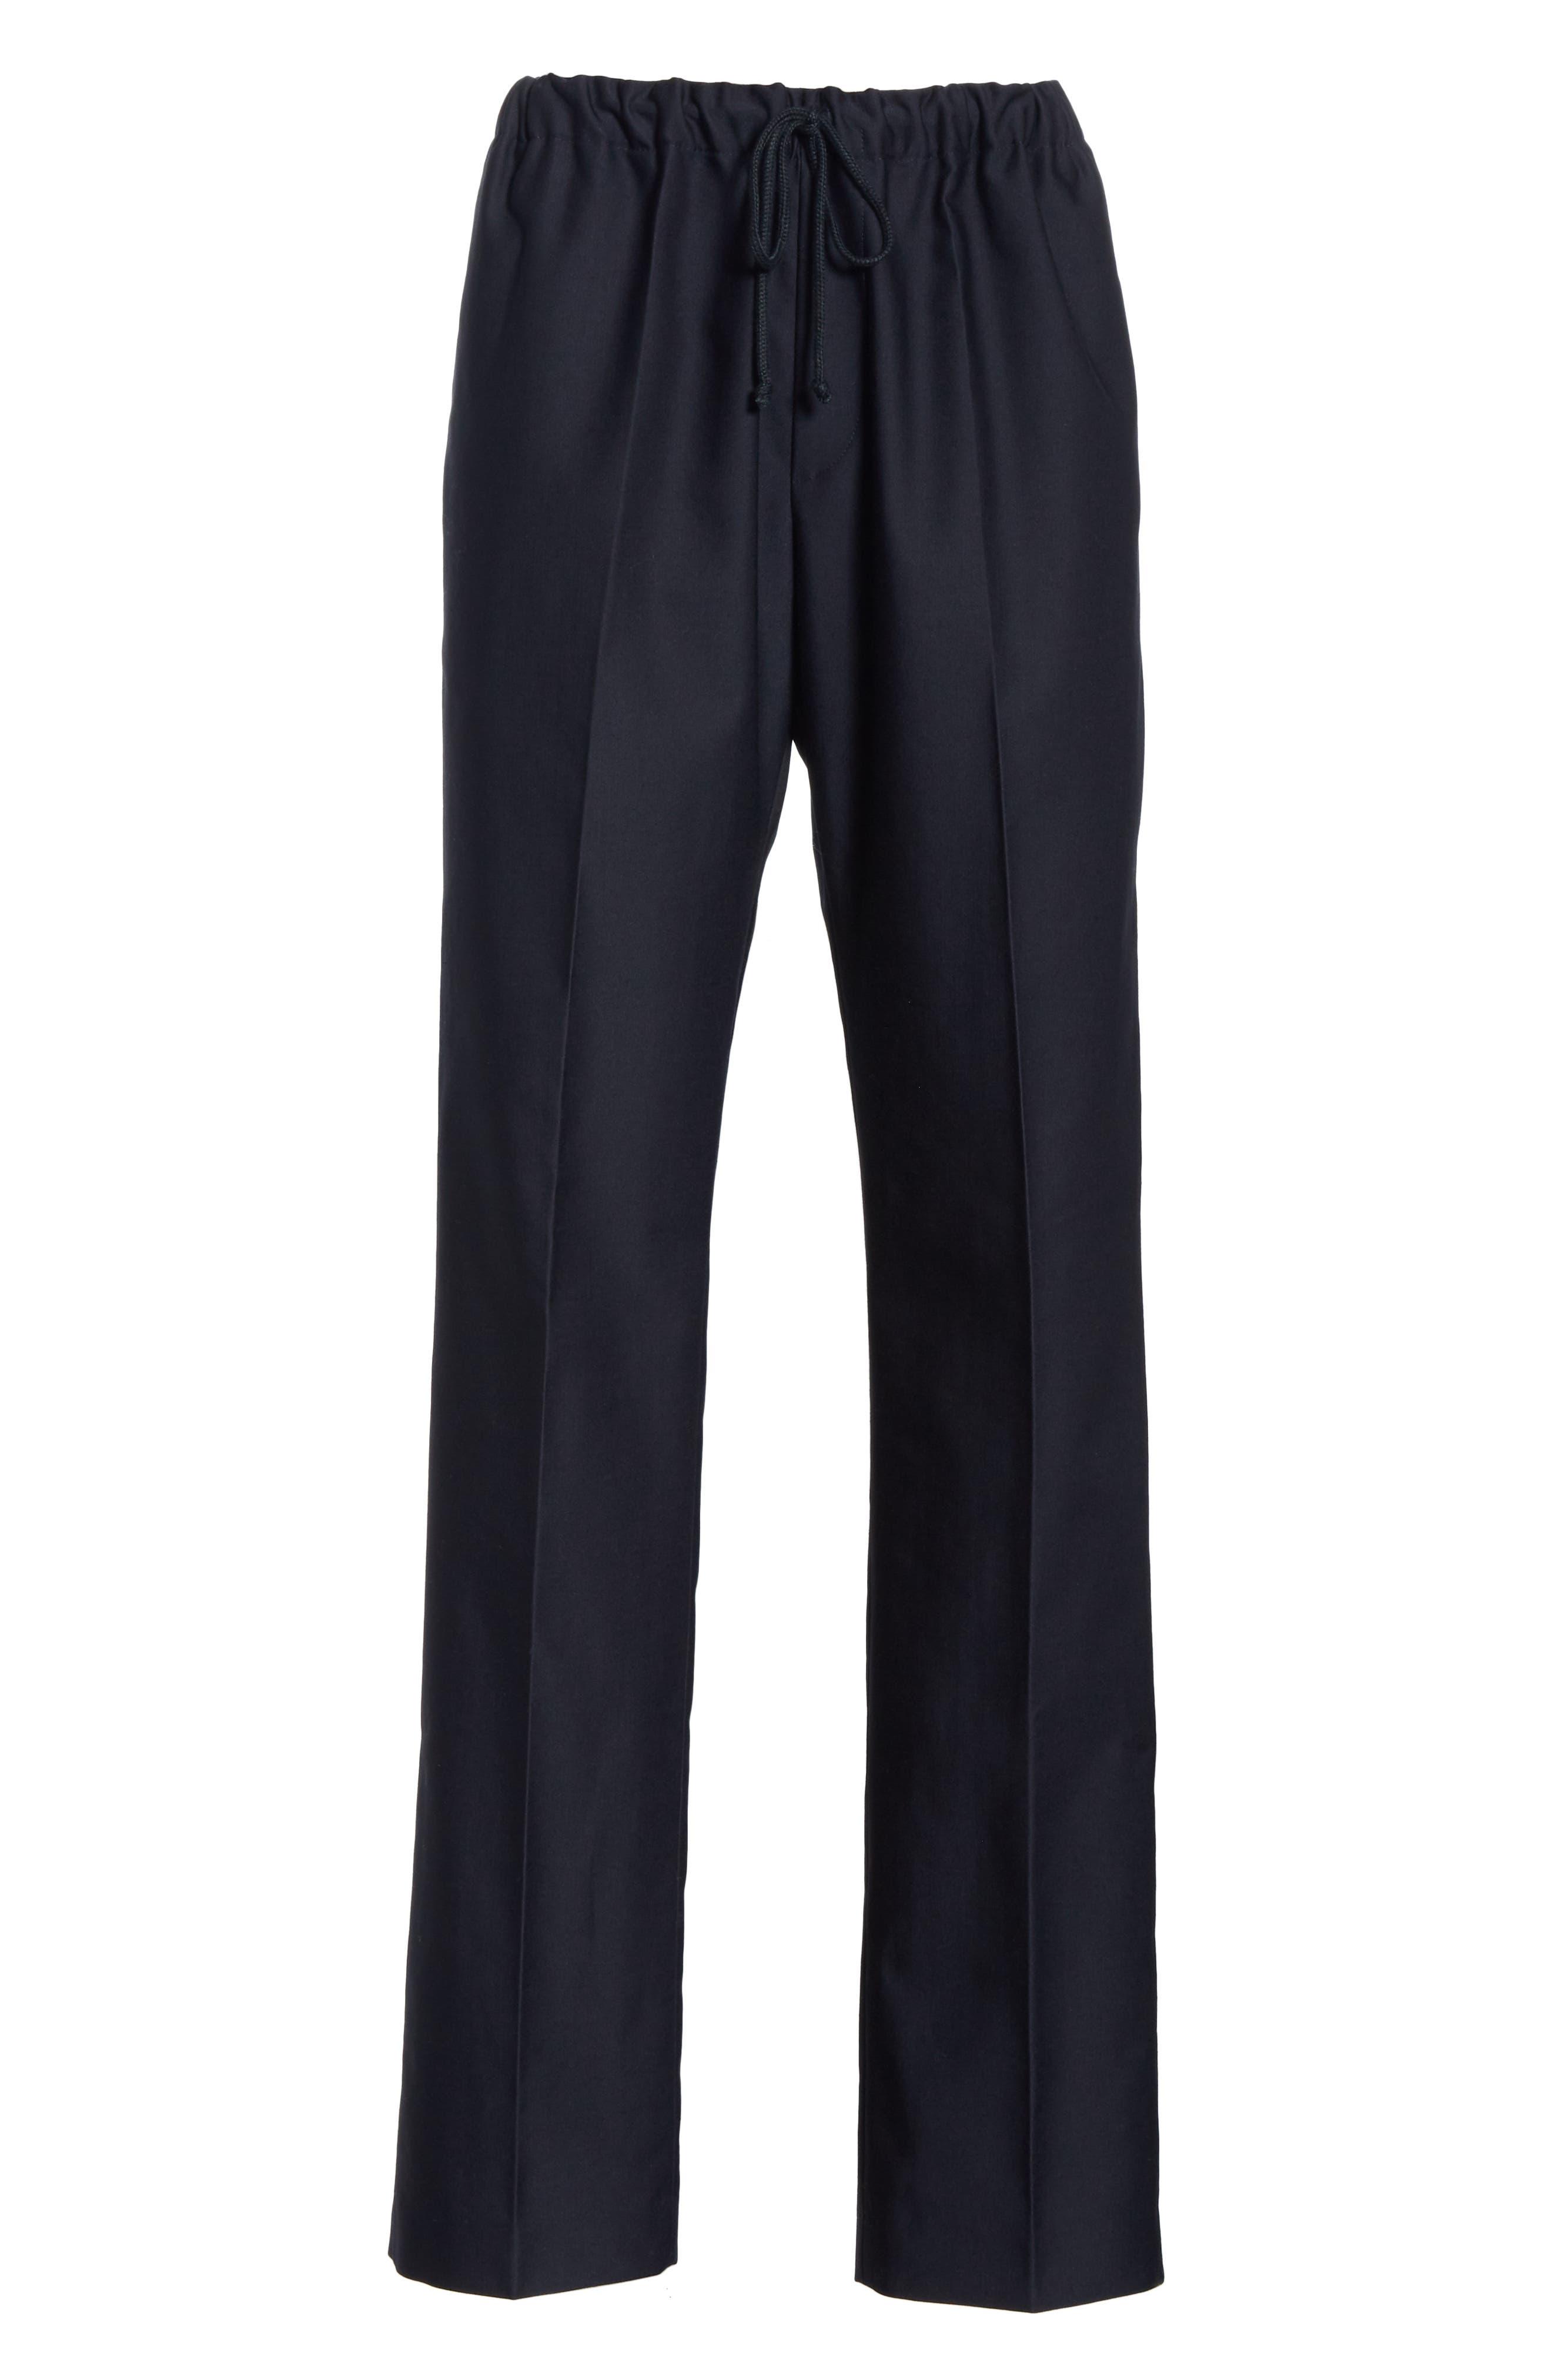 Perkino Drawstring Waist Pants,                             Alternate thumbnail 2, color,                             NAVY 509